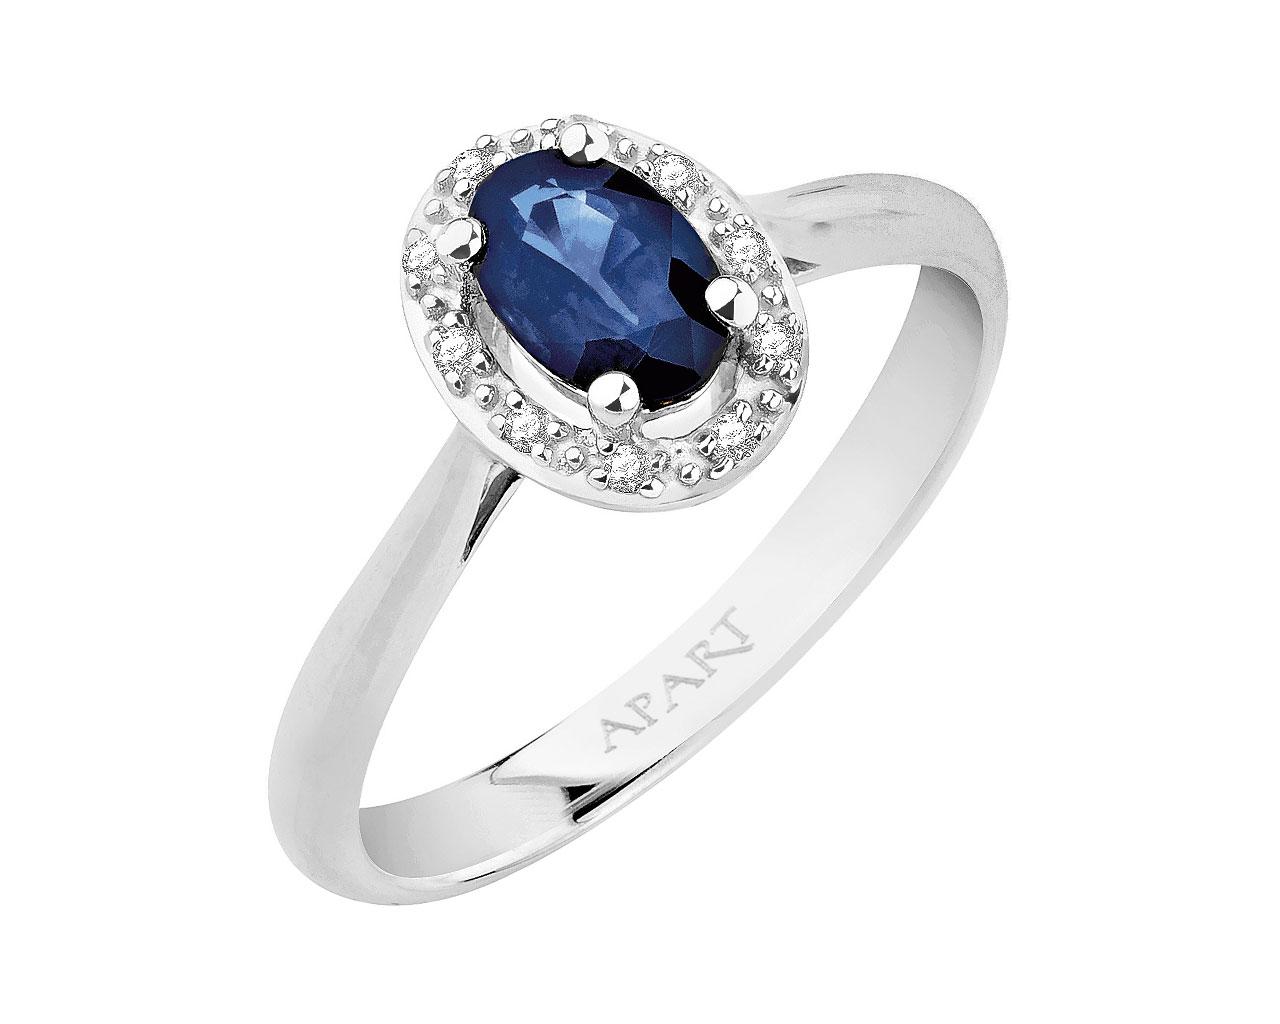 348302ebbbfa Anillo de oro blanco con diamantes y zafiro   Artelioni